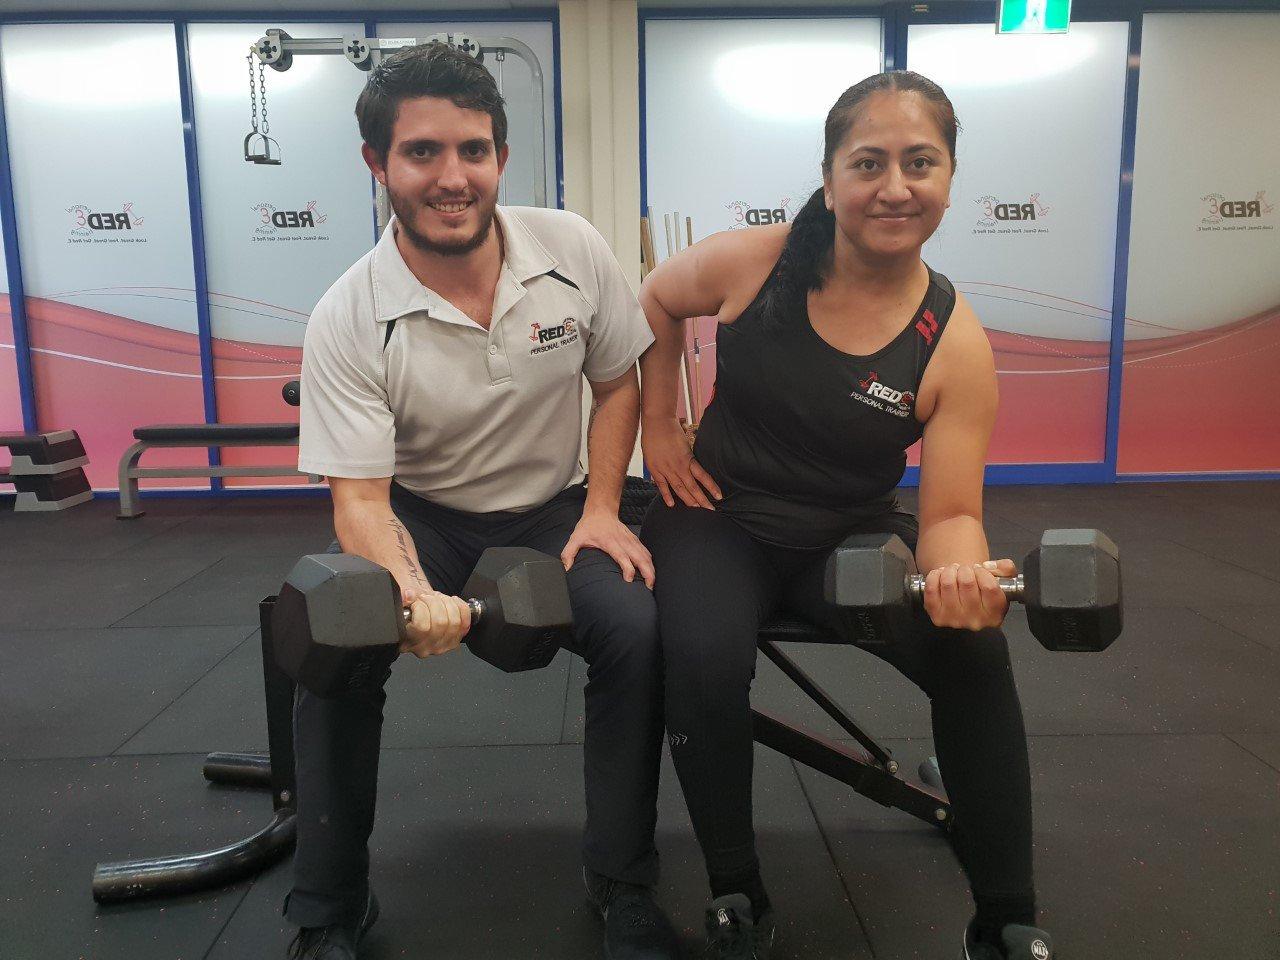 Red E Personal Training personal trainers Damien Everett and Vama Fatiaki.